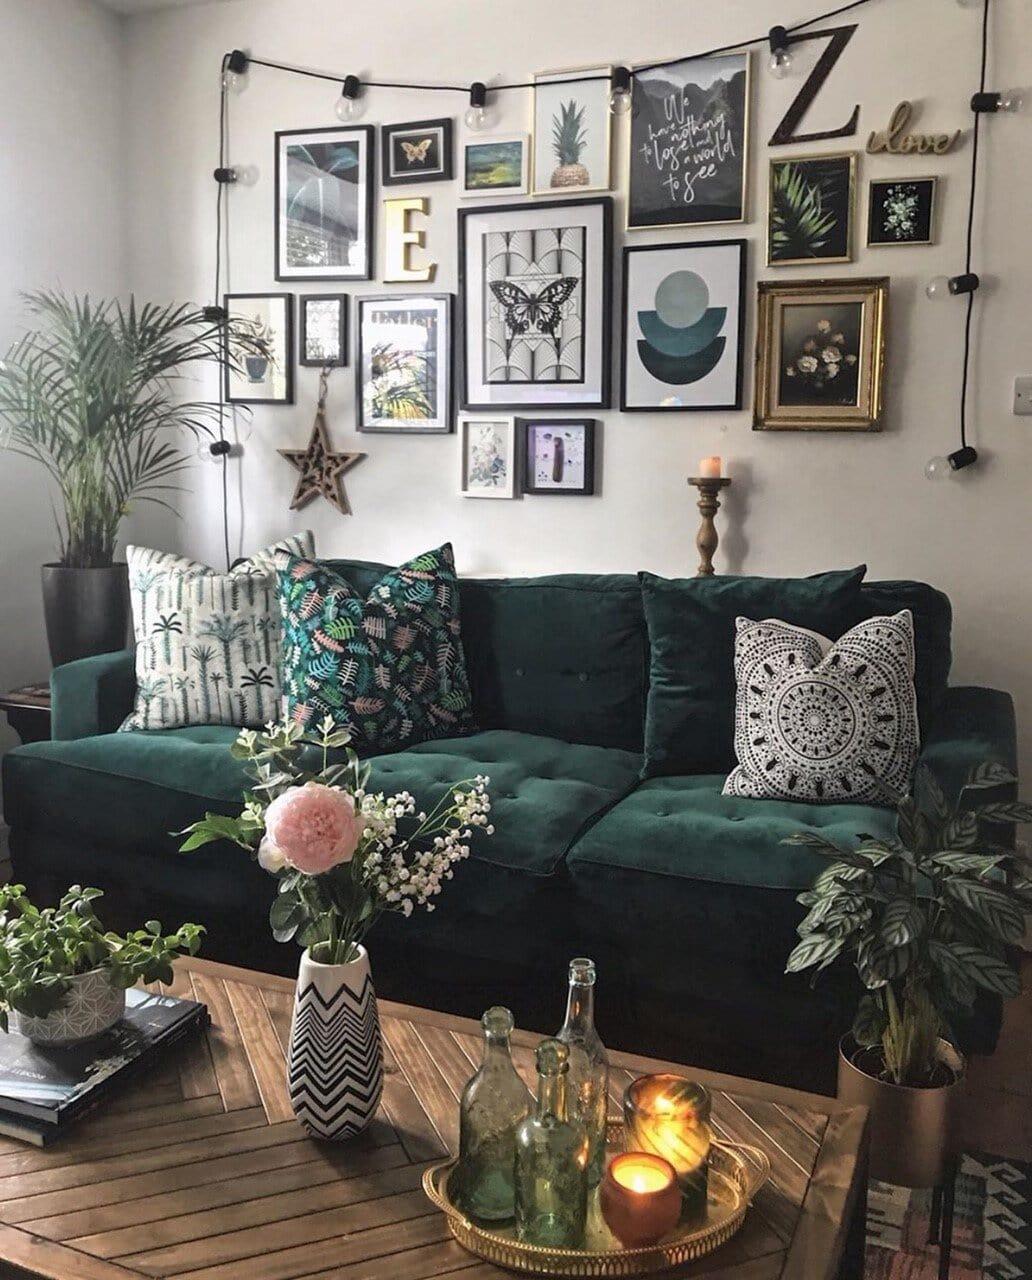 interior design, instagram, instagram trends, home decor, social media, blogging, instagram advice, blogging advice, pinterest, living room, gallery wall, green velvet sofa